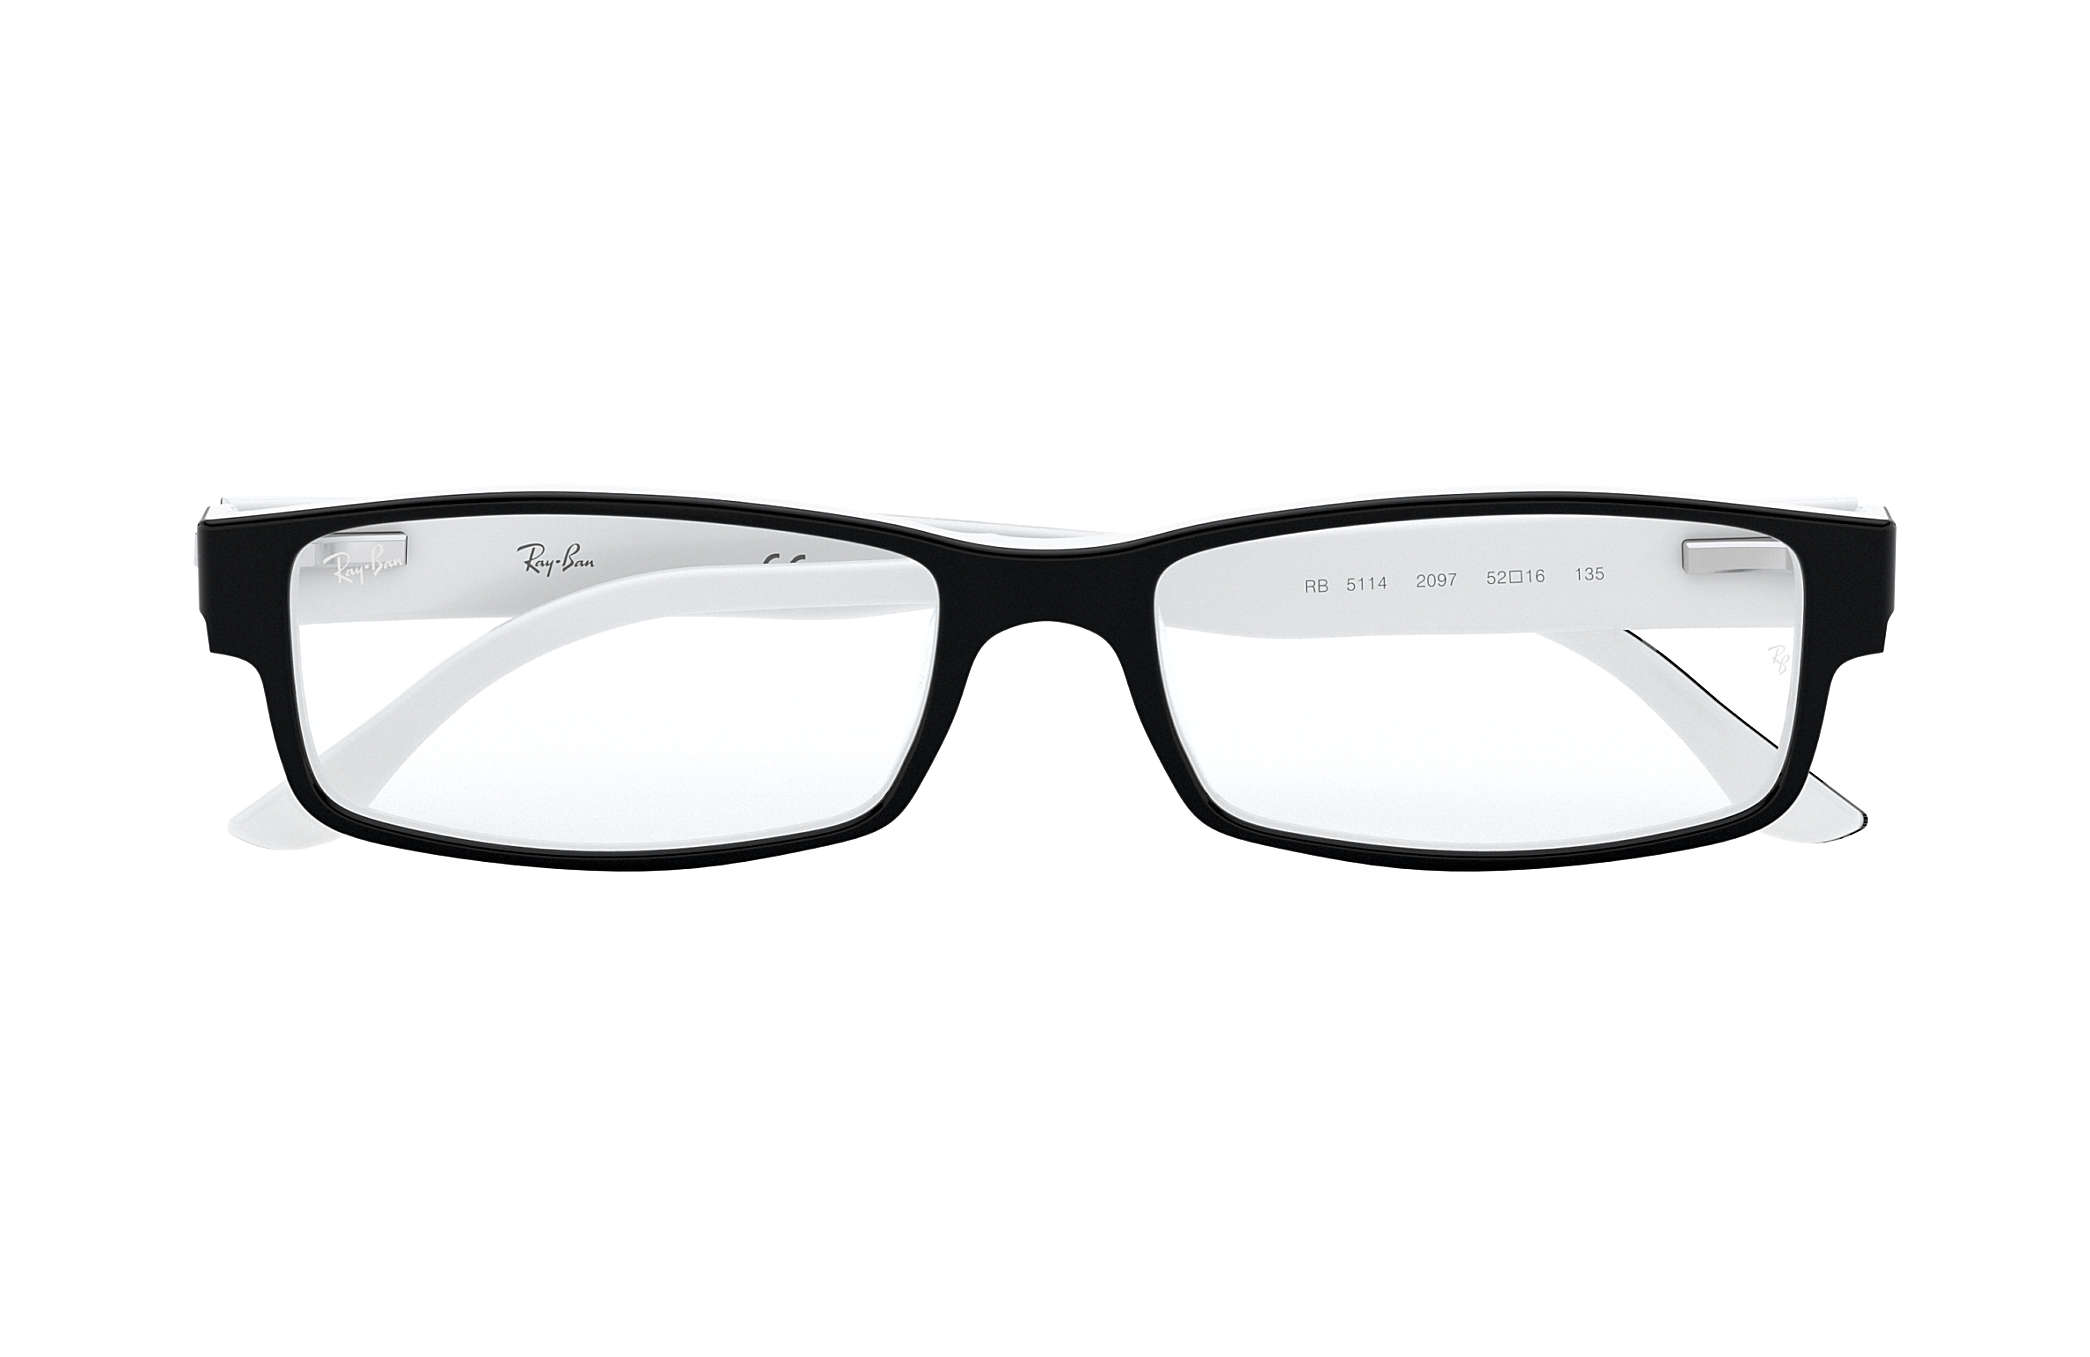 abad6099153 Ray-Ban prescription glasses RB5114 Black - Acetate - 0RX5114209752 ...